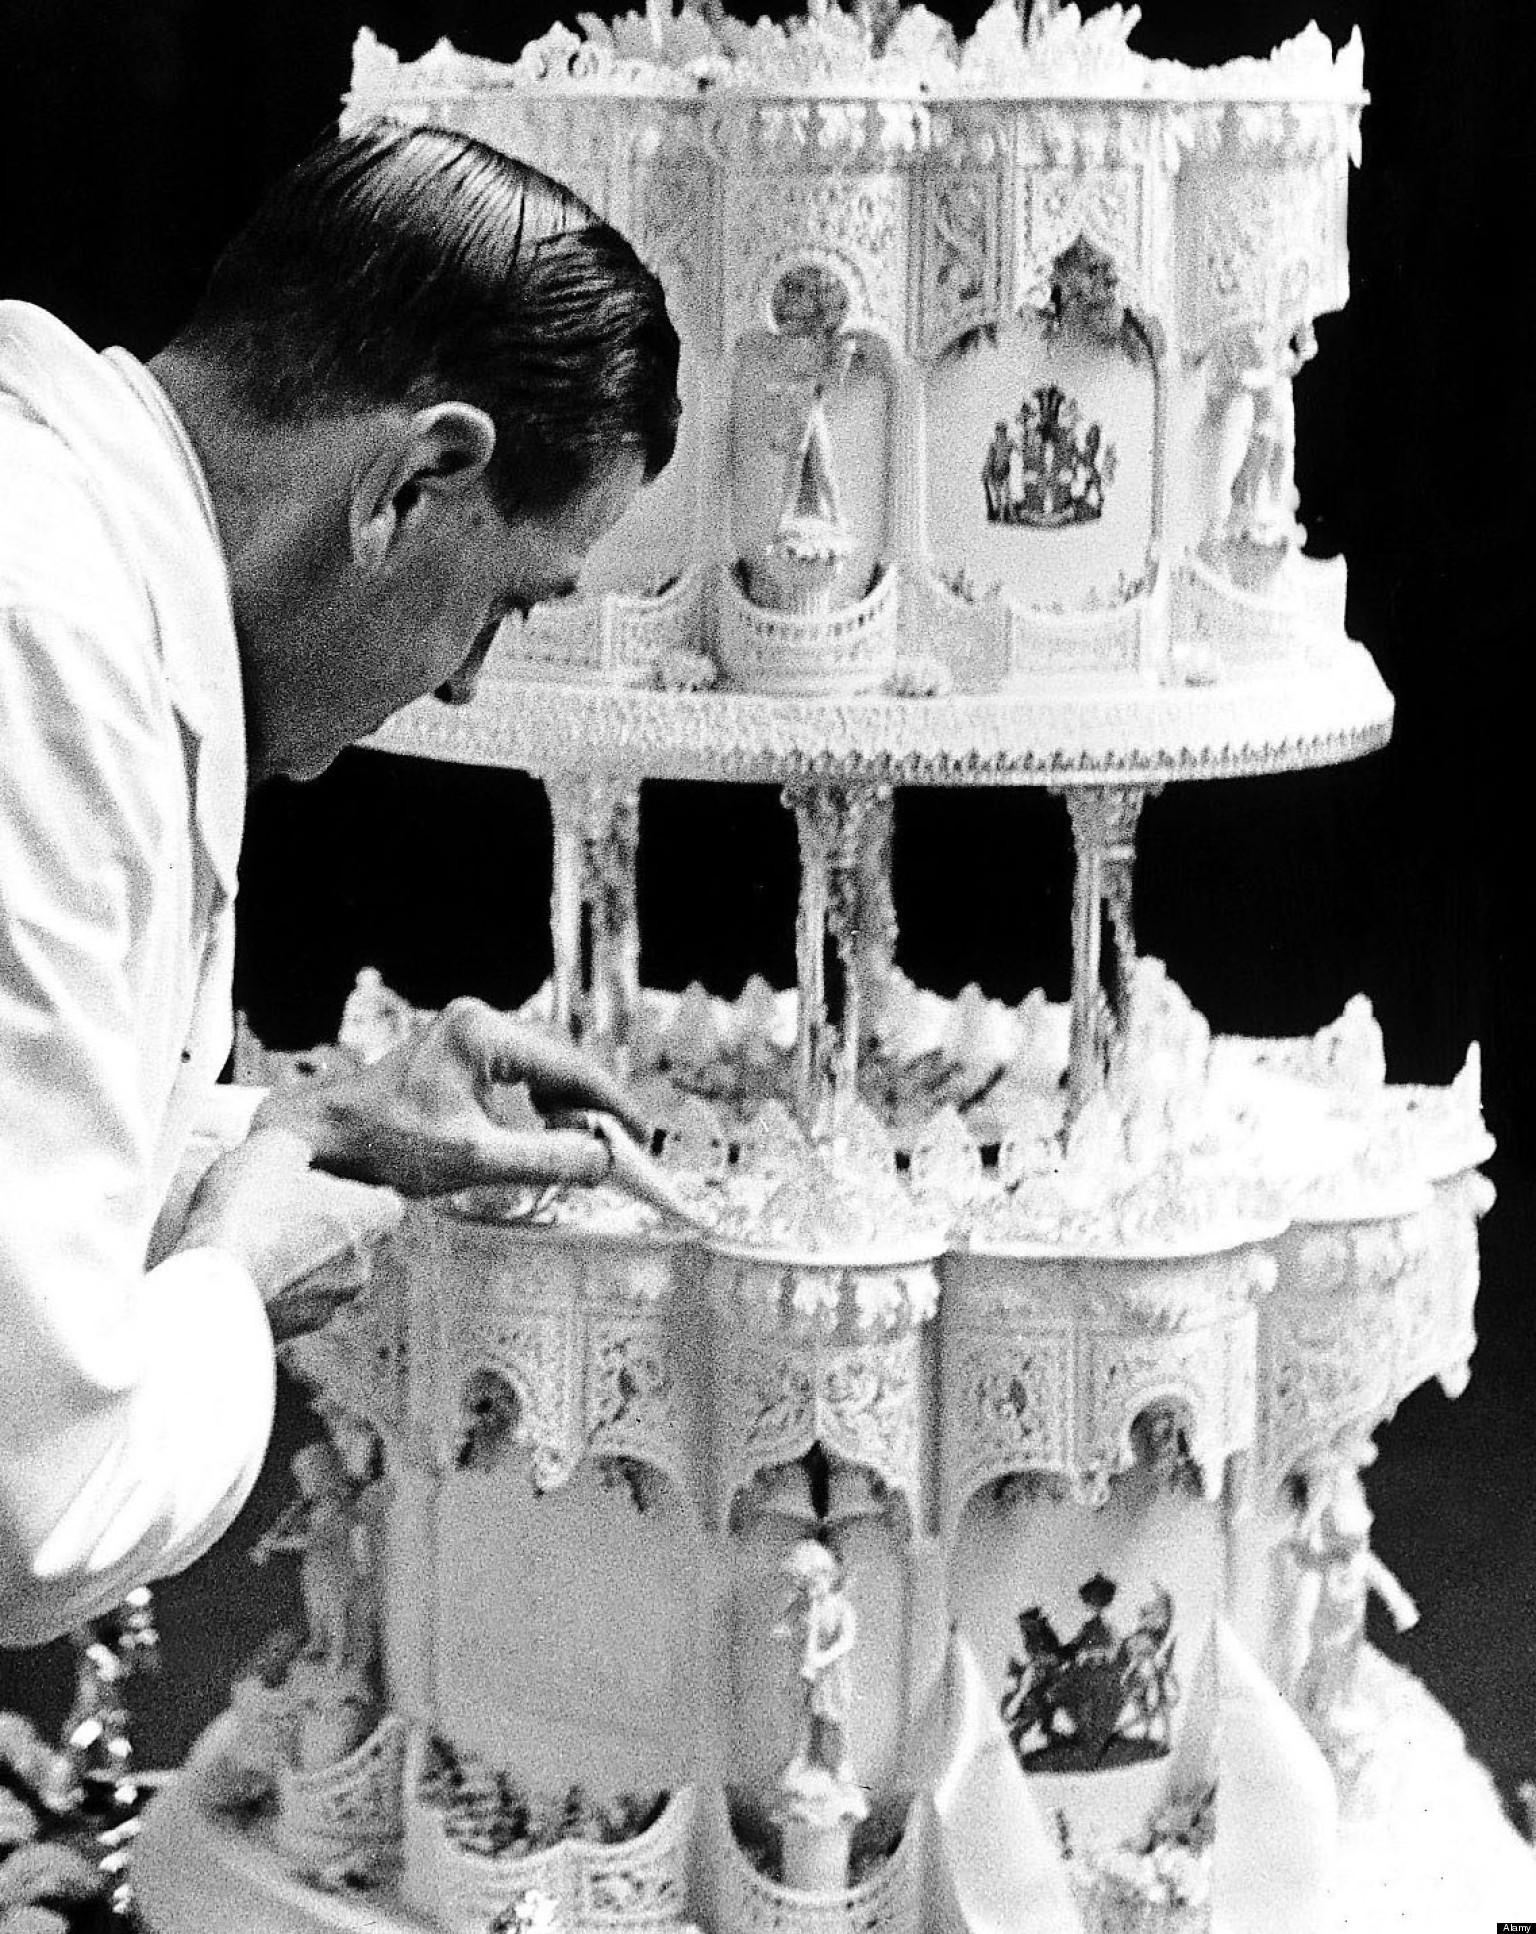 Alluring Royal Wedding Slice Royal Wedding Cake Elderberry Royal Wedding Cake Miniature Queen Wedding Cake Up Huffpost Royal Wedding Slice Queen Wedding Cake Up wedding cake Royal Wedding Cake